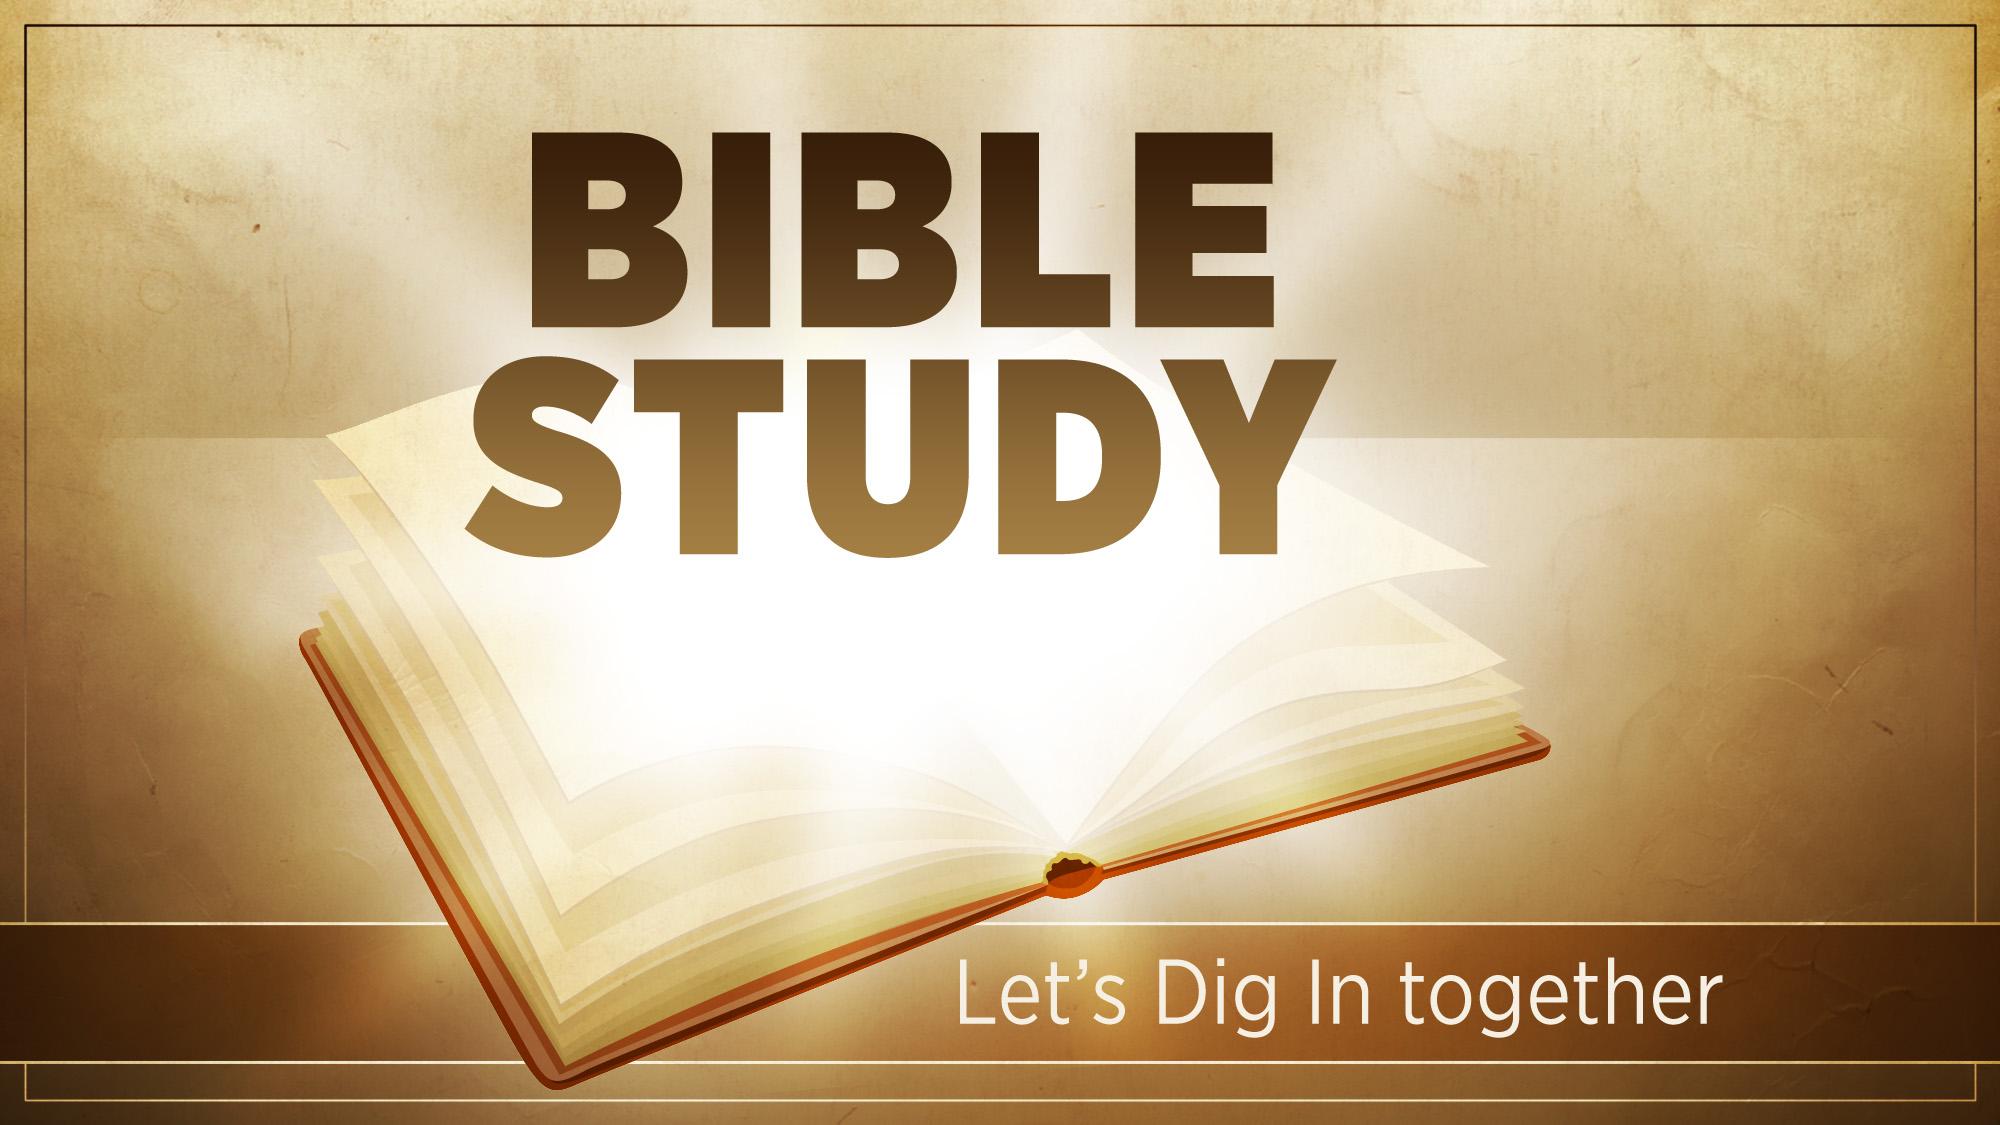 bible study_wide_t.jpg